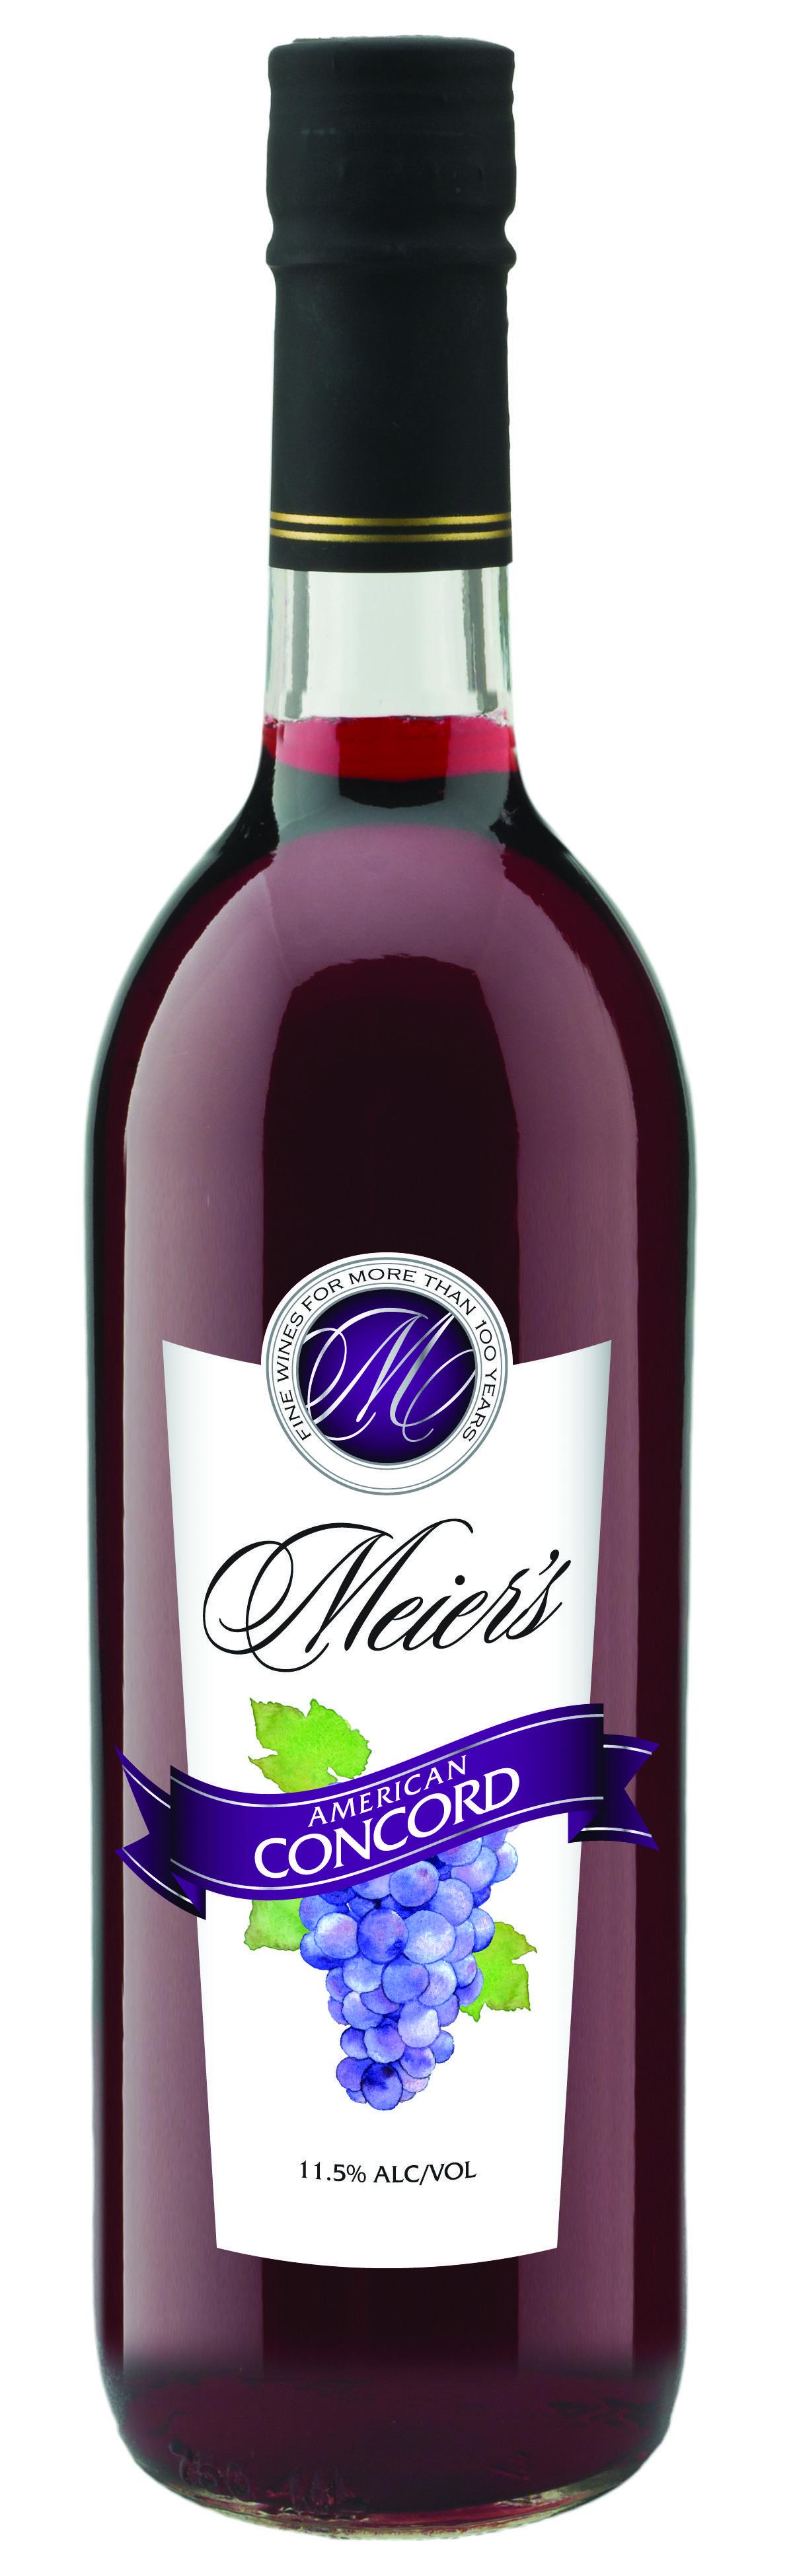 Meier S Fruit Wines Image Library